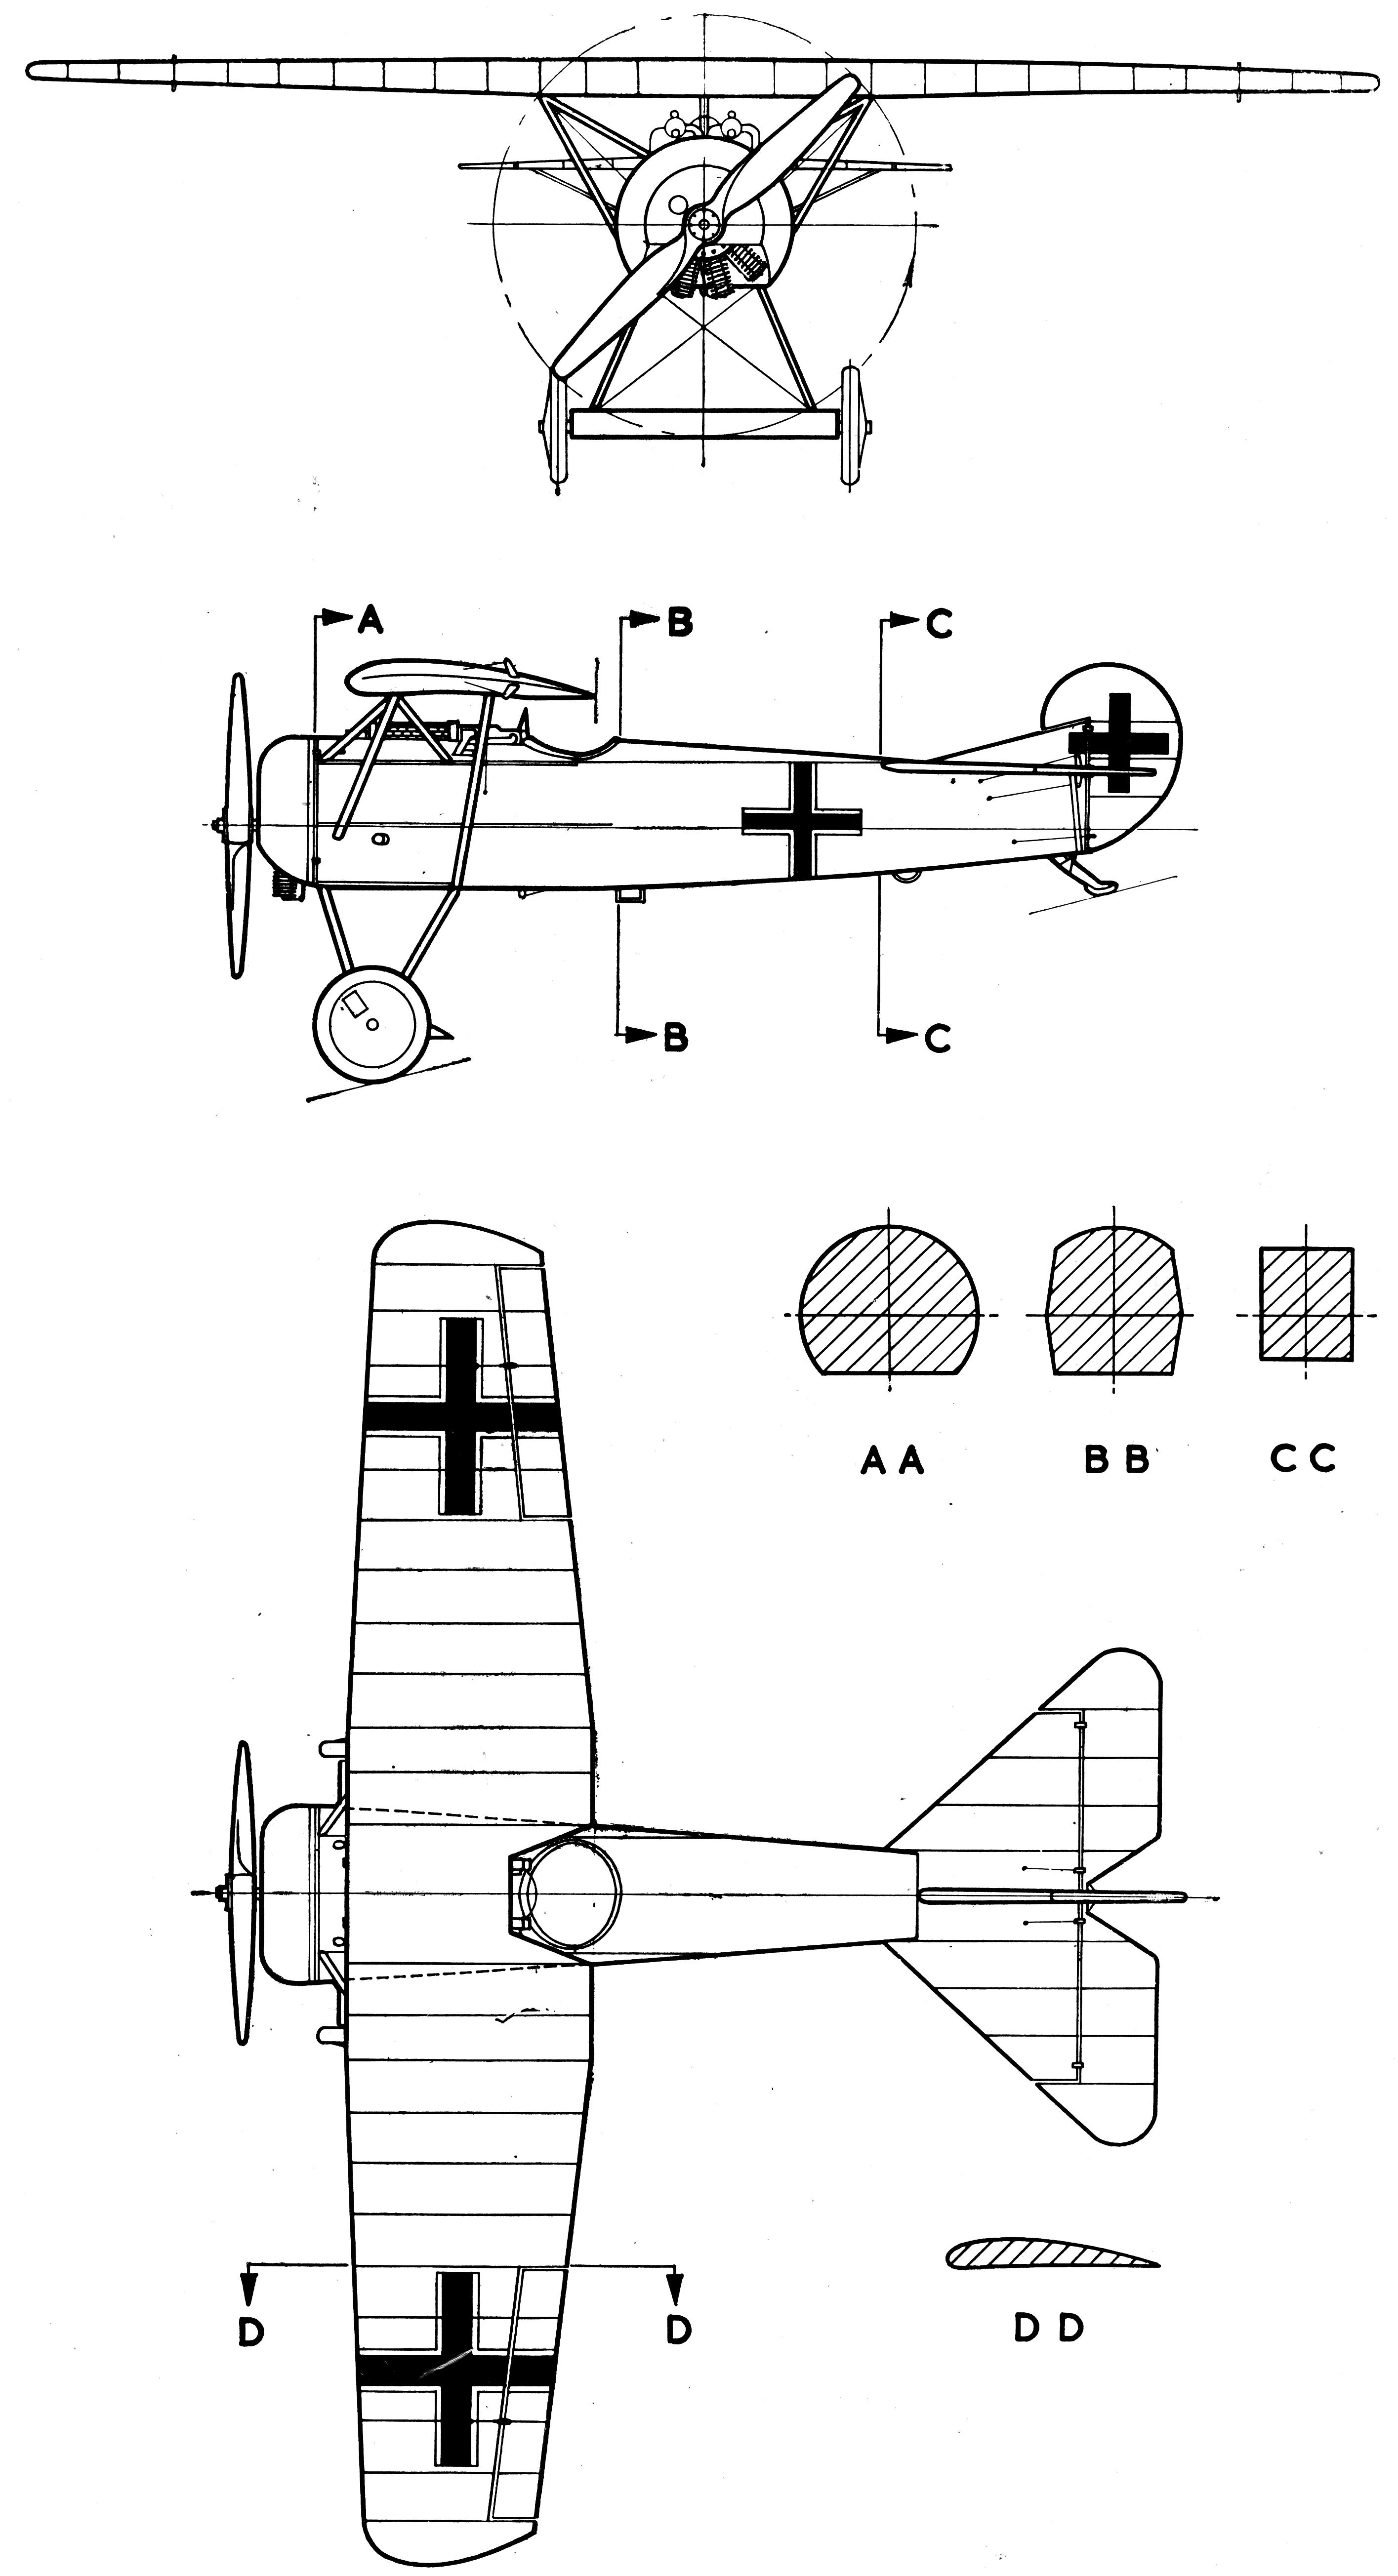 Fokker D Viii Blueprint Blueprints